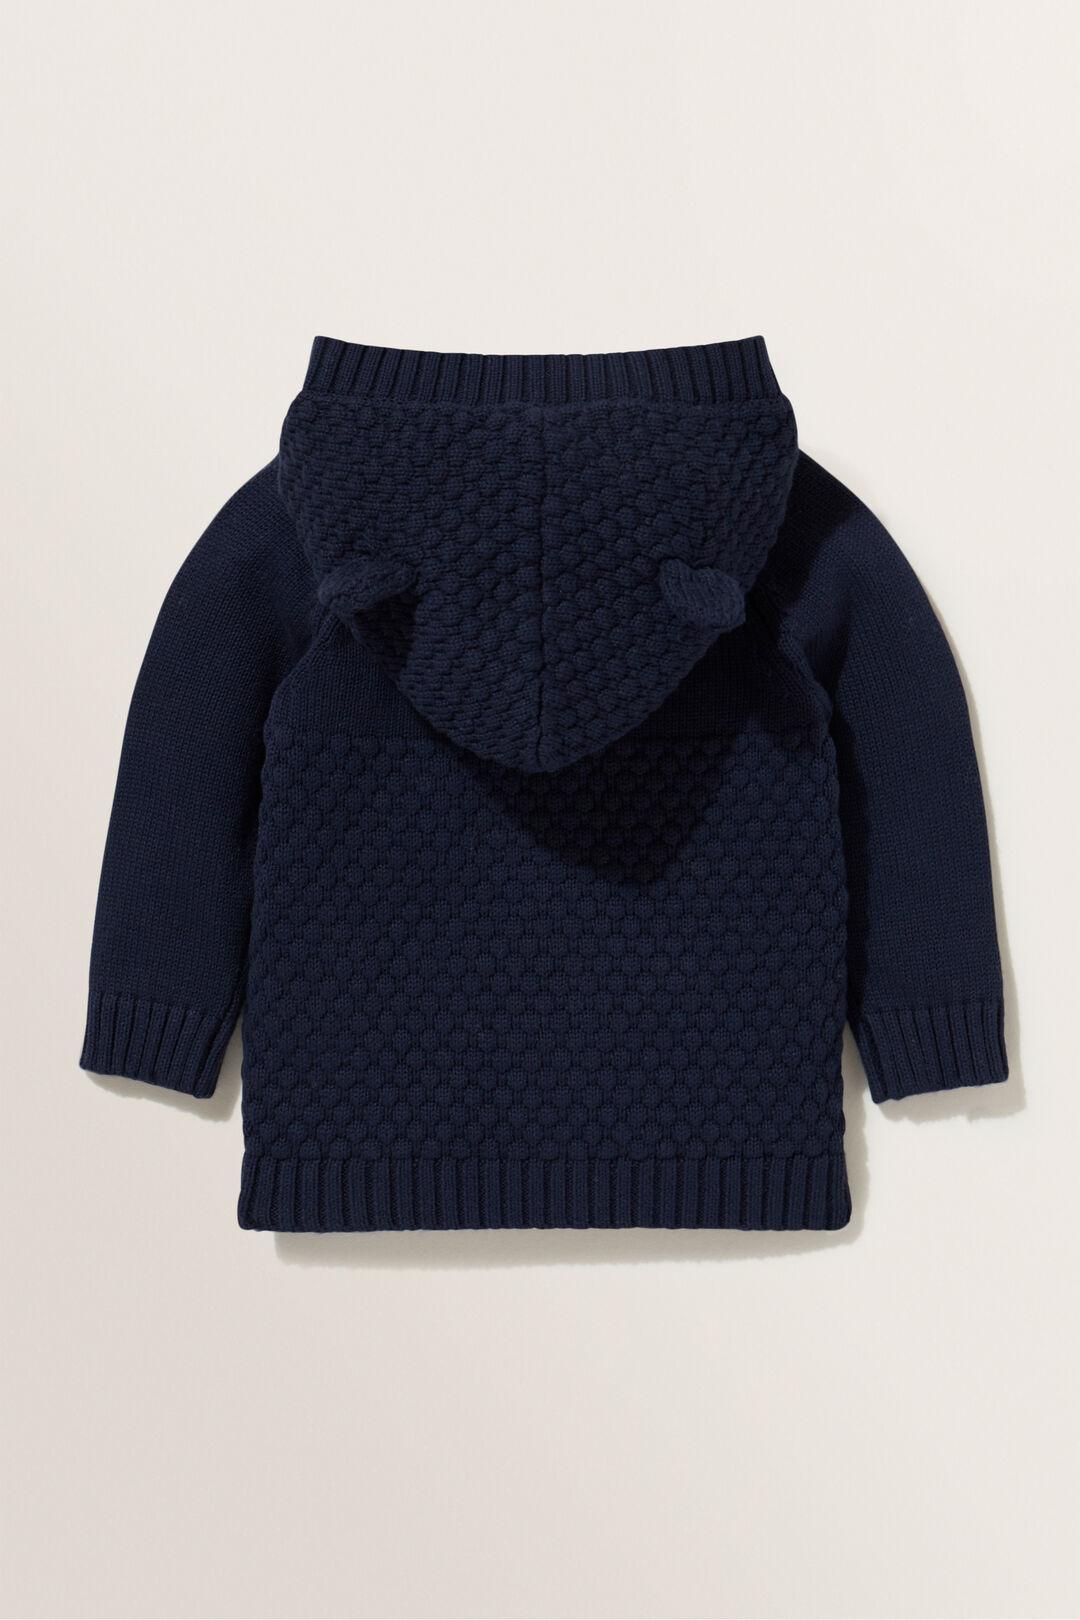 Honeycomb Stitch Cardigan  MIDNIGHT BLUE  hi-res